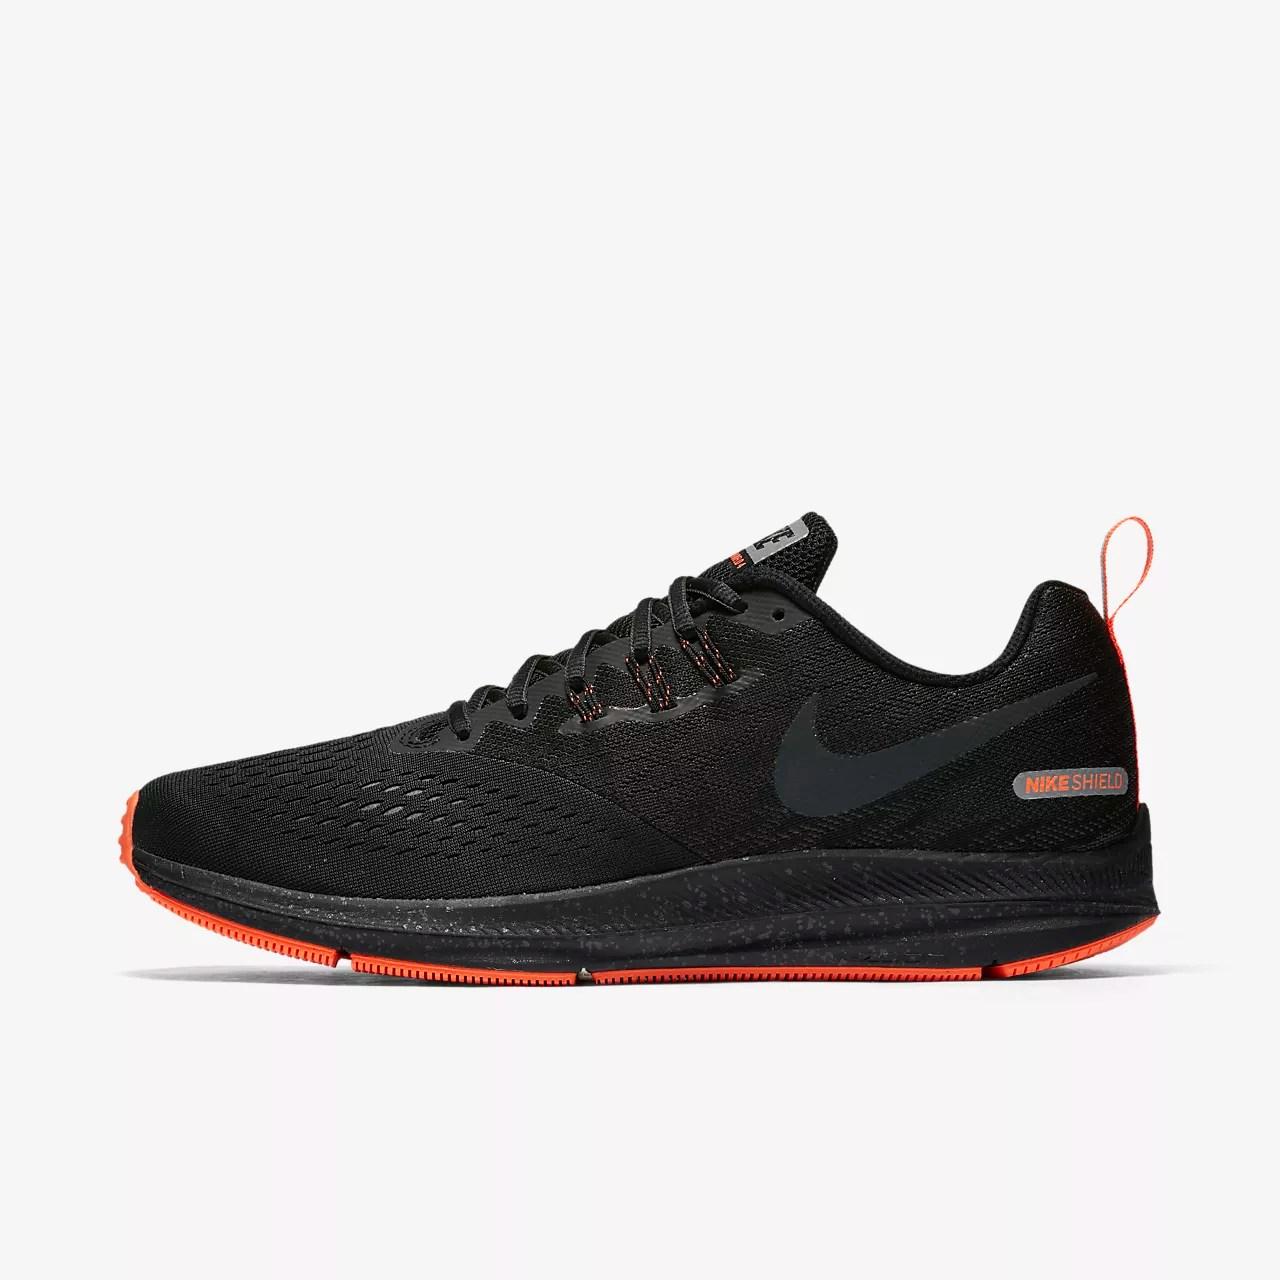 Nike Zoom Winflo 4 Shield 男子跑步鞋-耐克(Nike)中國官網